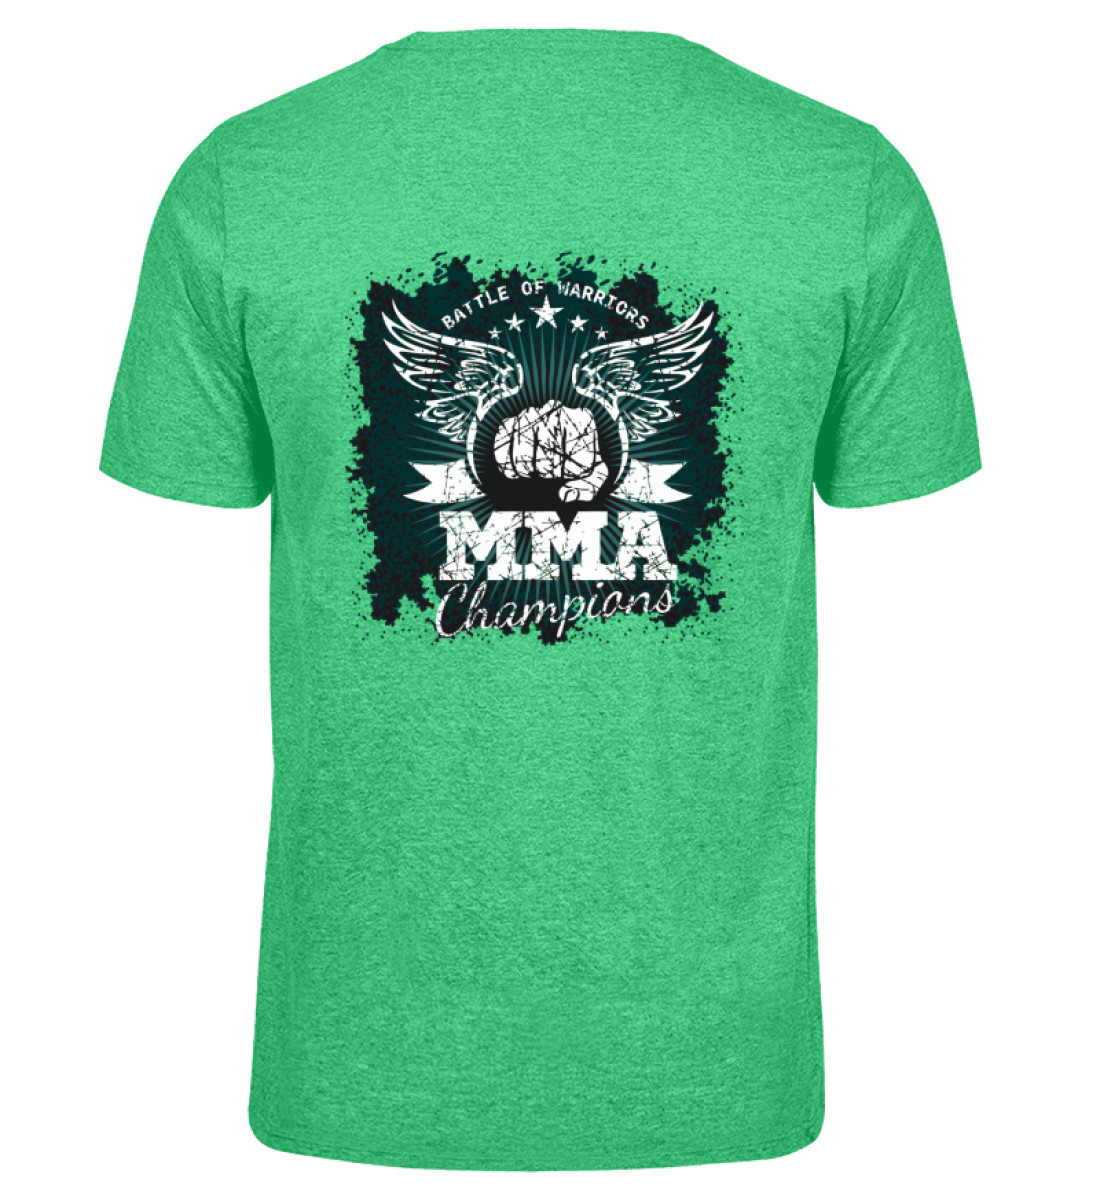 COMA Team - MMA Champions - Herren Melange Shirt-6804